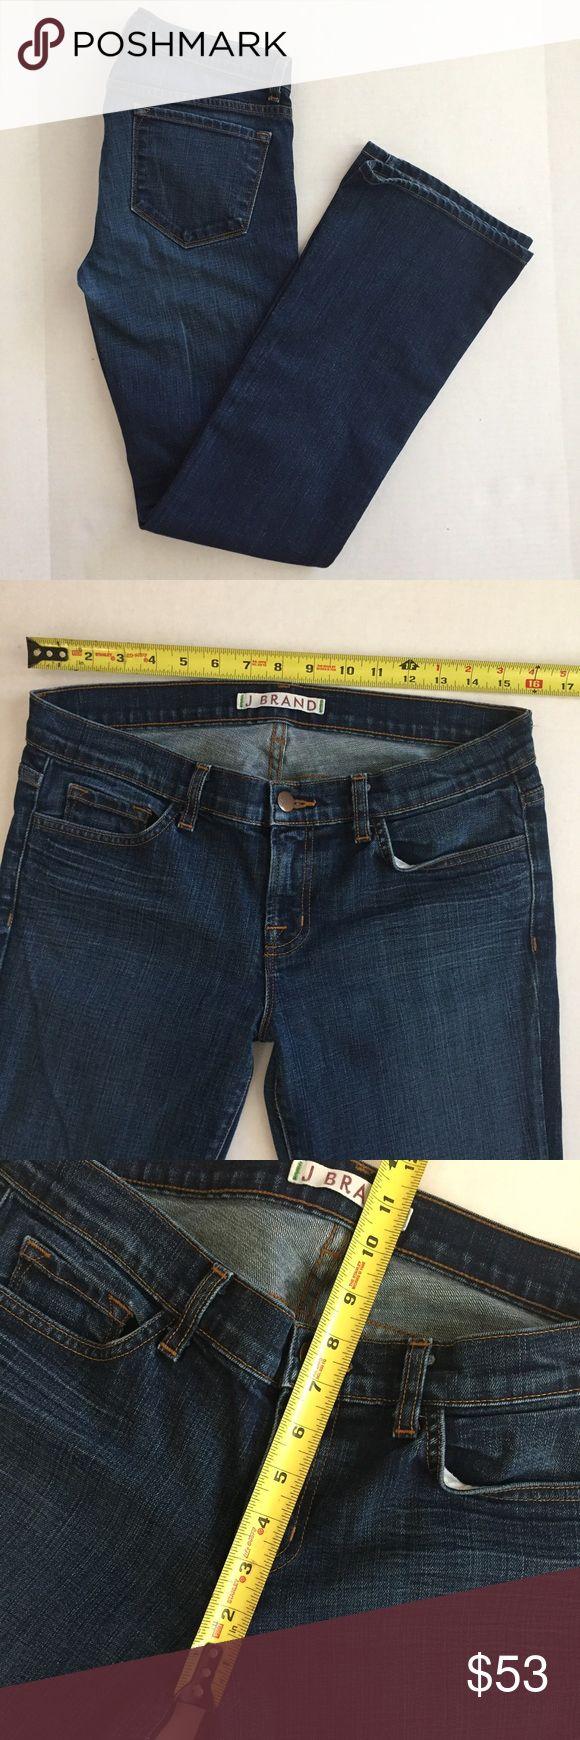 J Brand Jeans J Brand - GUC J Brand Jeans Boot Cut